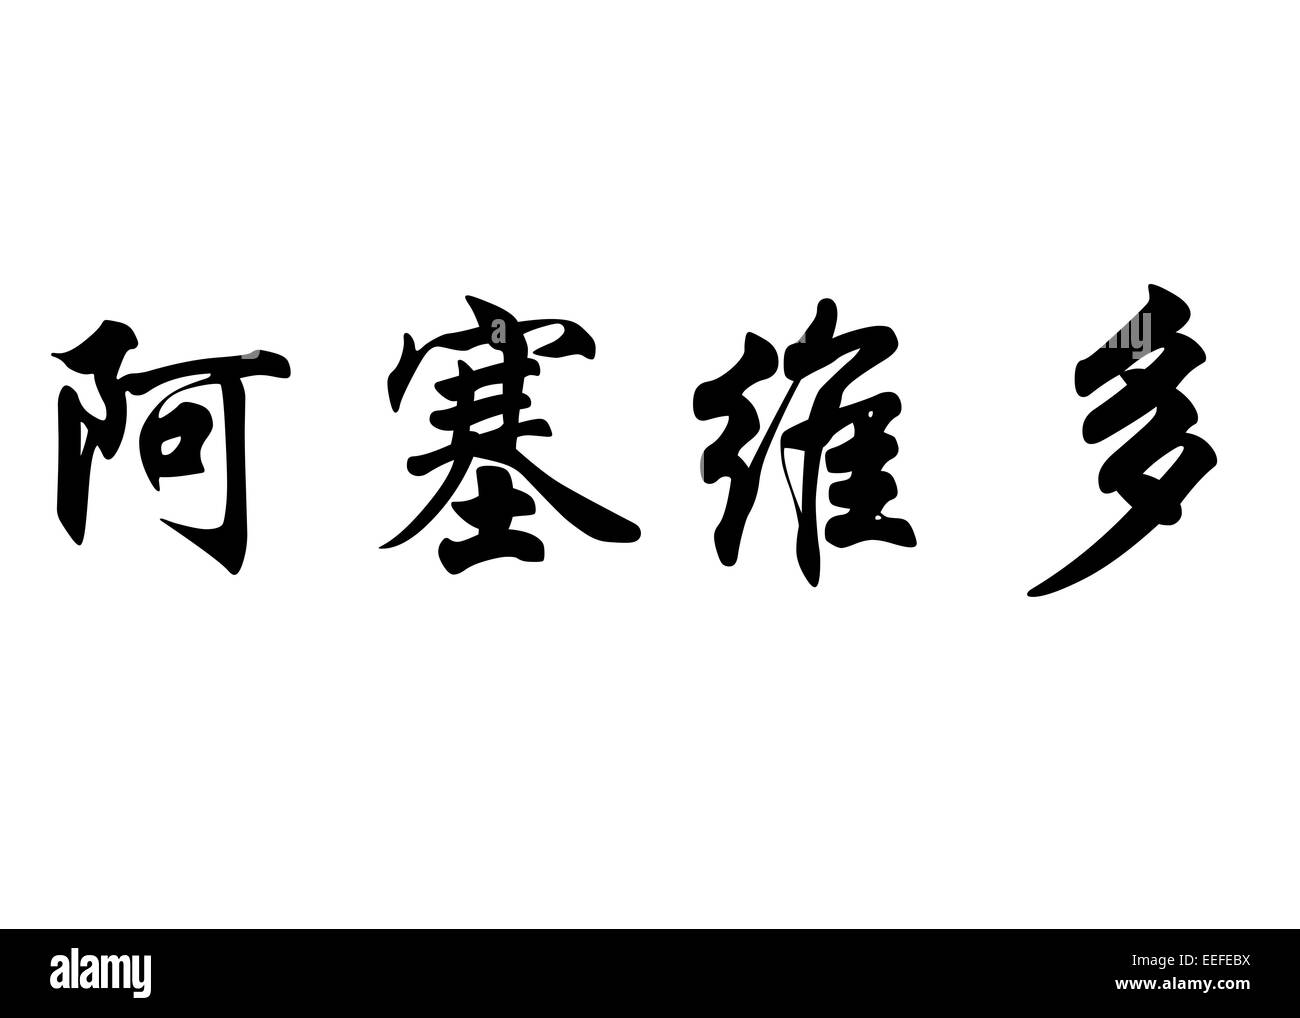 English name acevedo in chinese kanji calligraphy characters or english name acevedo in chinese kanji calligraphy characters or japanese characters biocorpaavc Choice Image